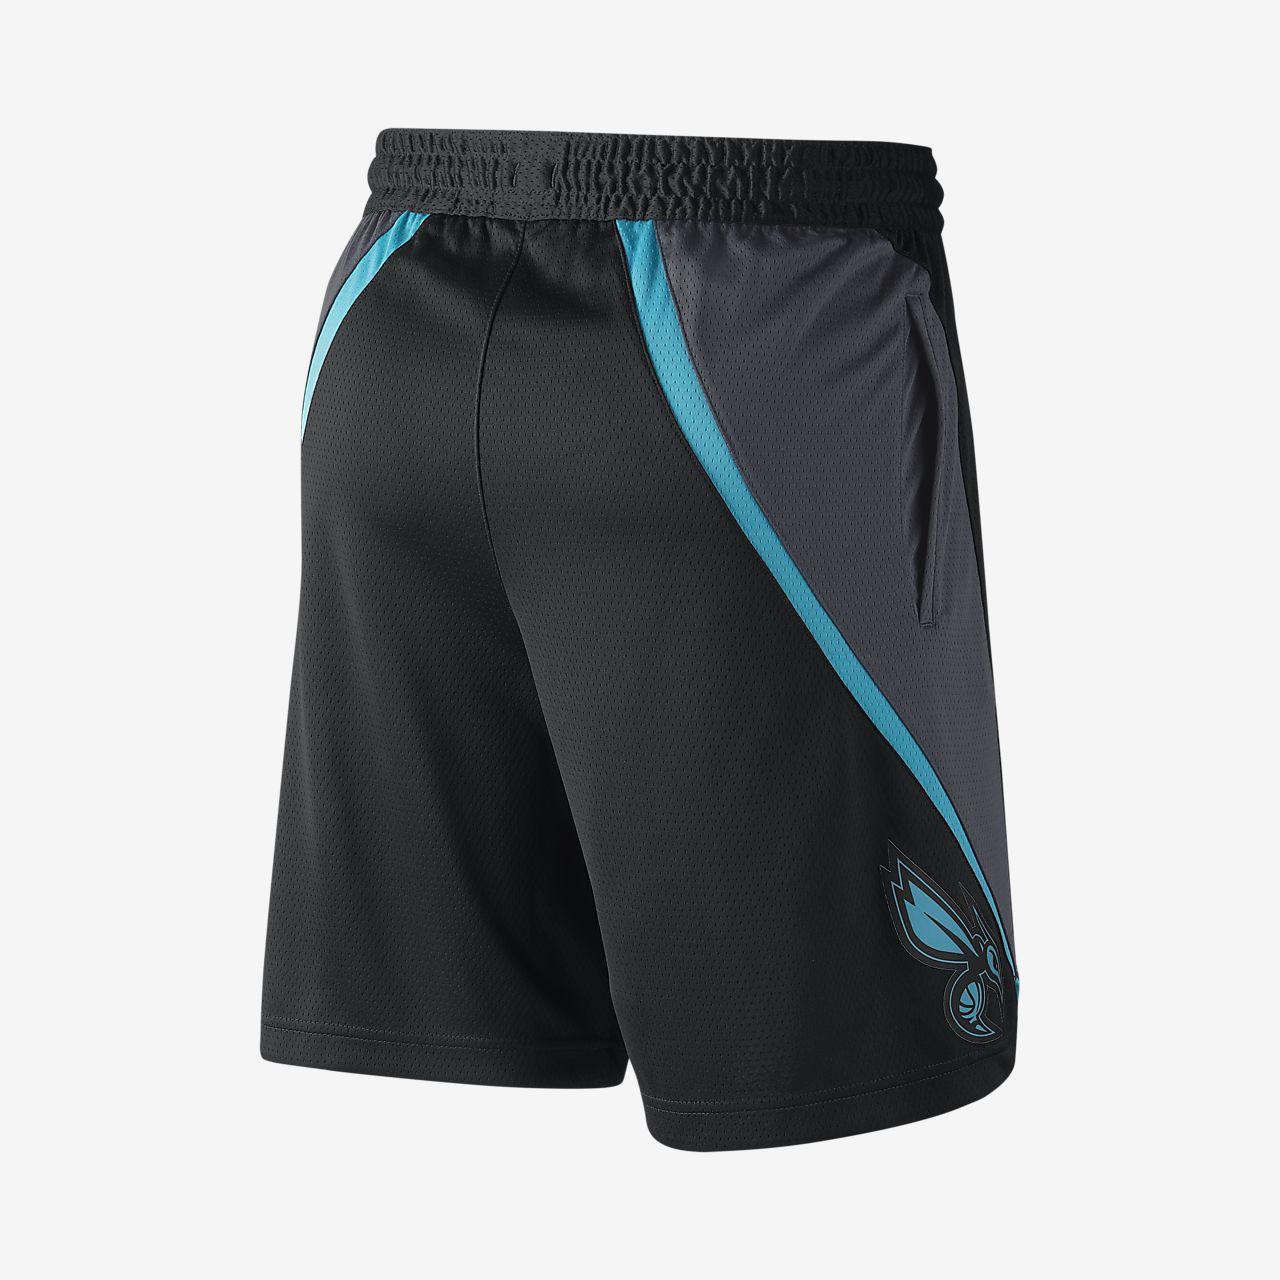 c46cdea3404 ... Charlotte Hornets City Edition Swingman Men's Jordan NBA Shorts